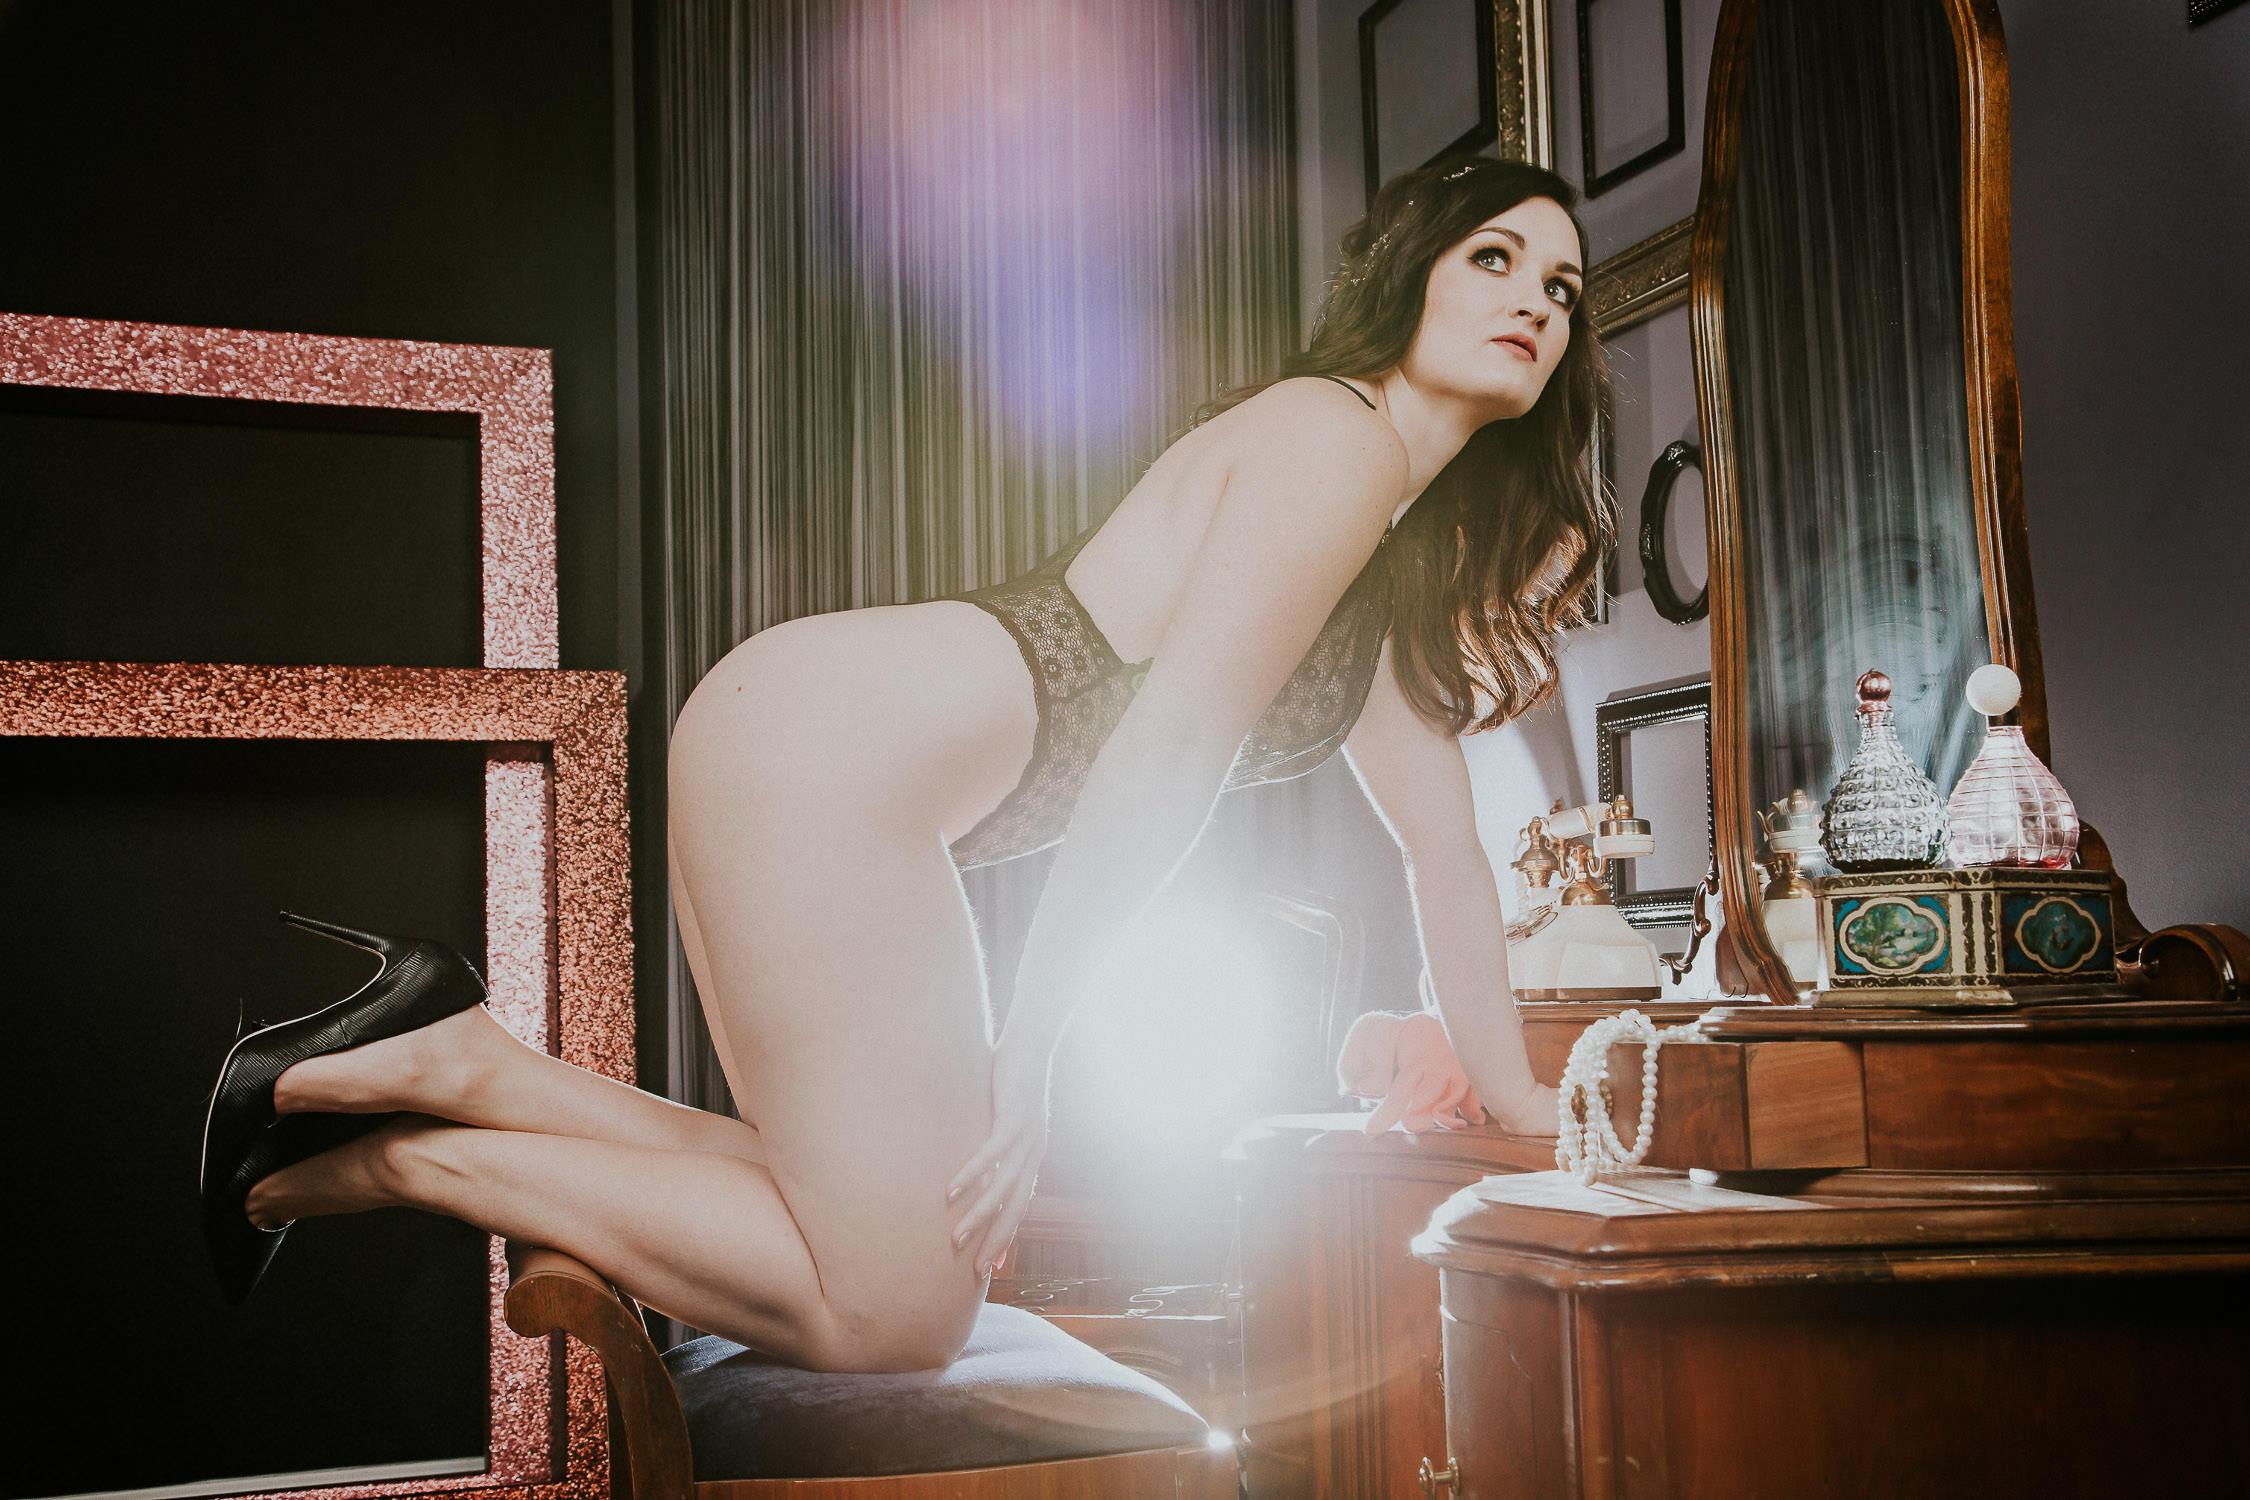 calgary-boudoir-photographer-make-up-mirror-0007